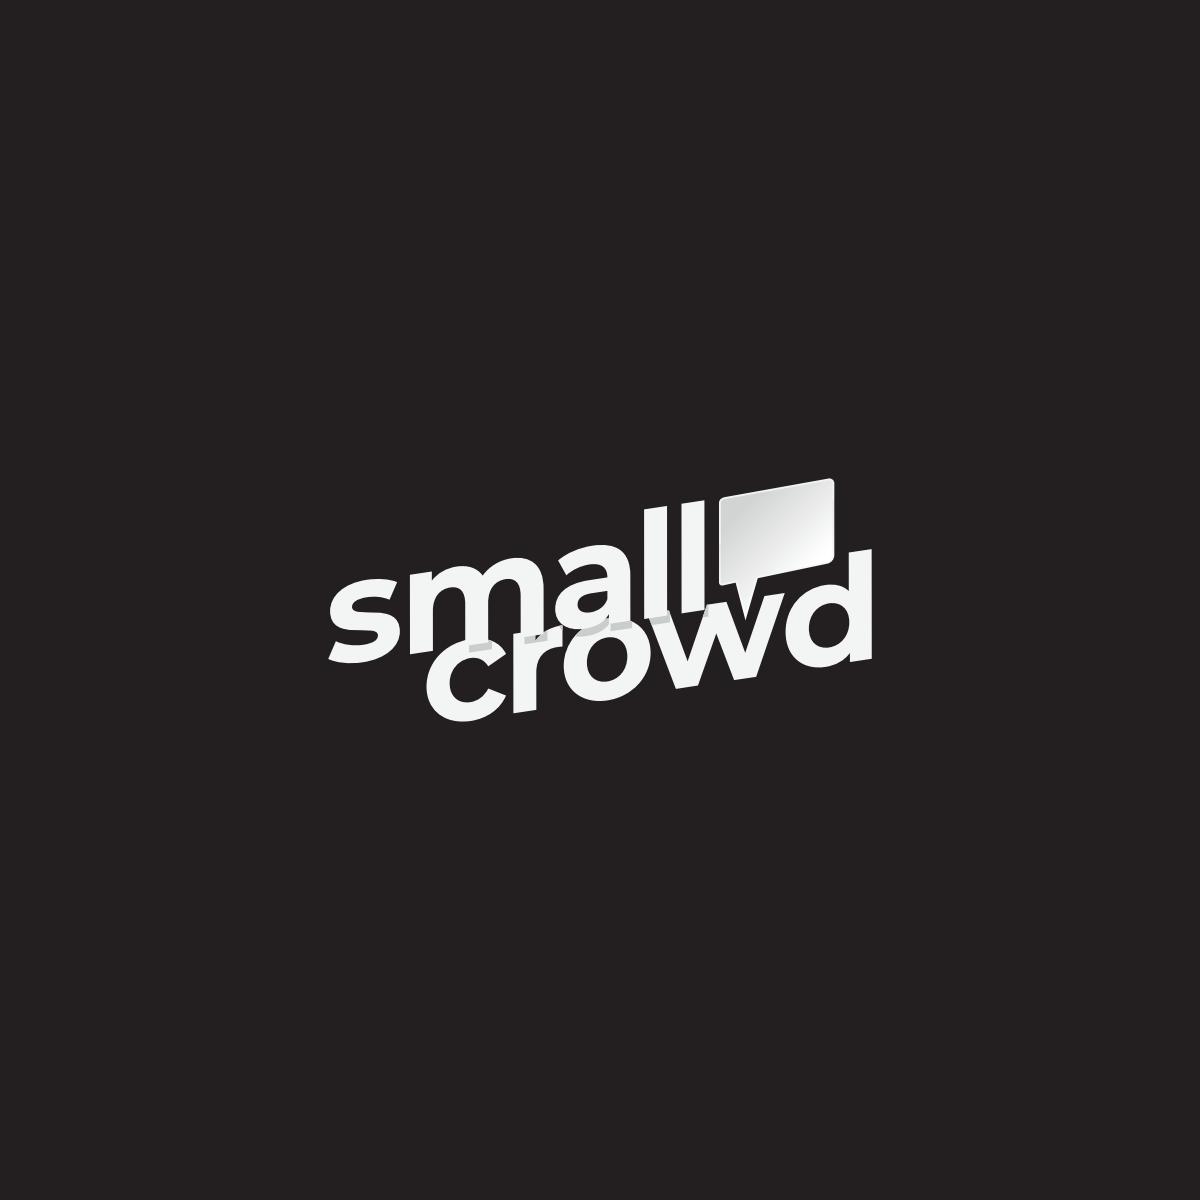 SmallCrowd Logo (Digital Marketing Agency)